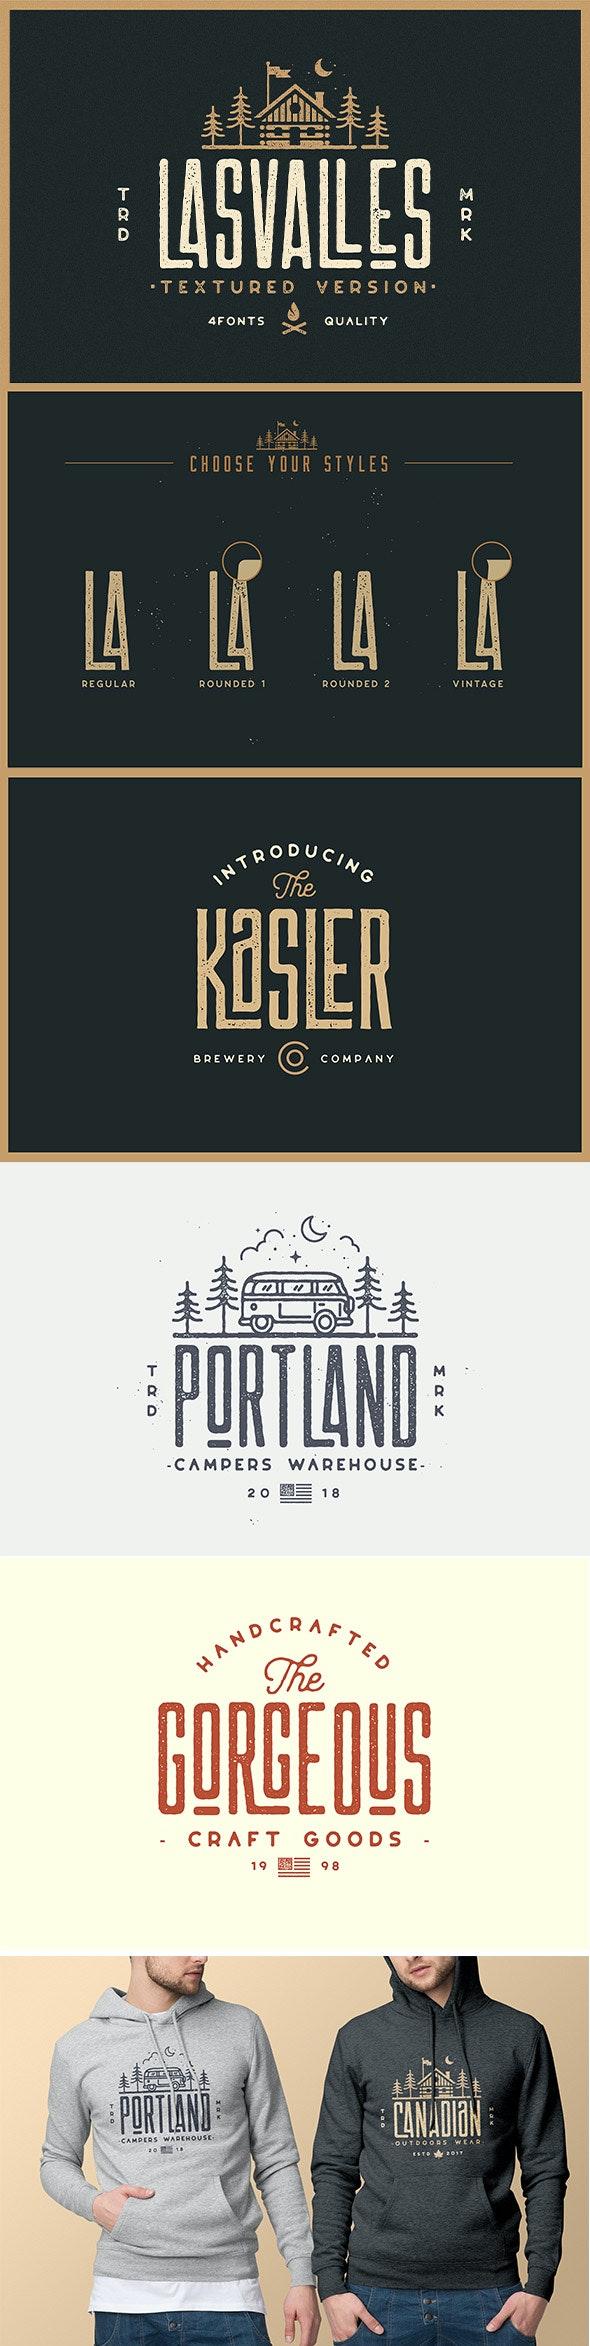 Las Valles Textured Condensed Typeface 4 Fonts - Condensed Sans-Serif